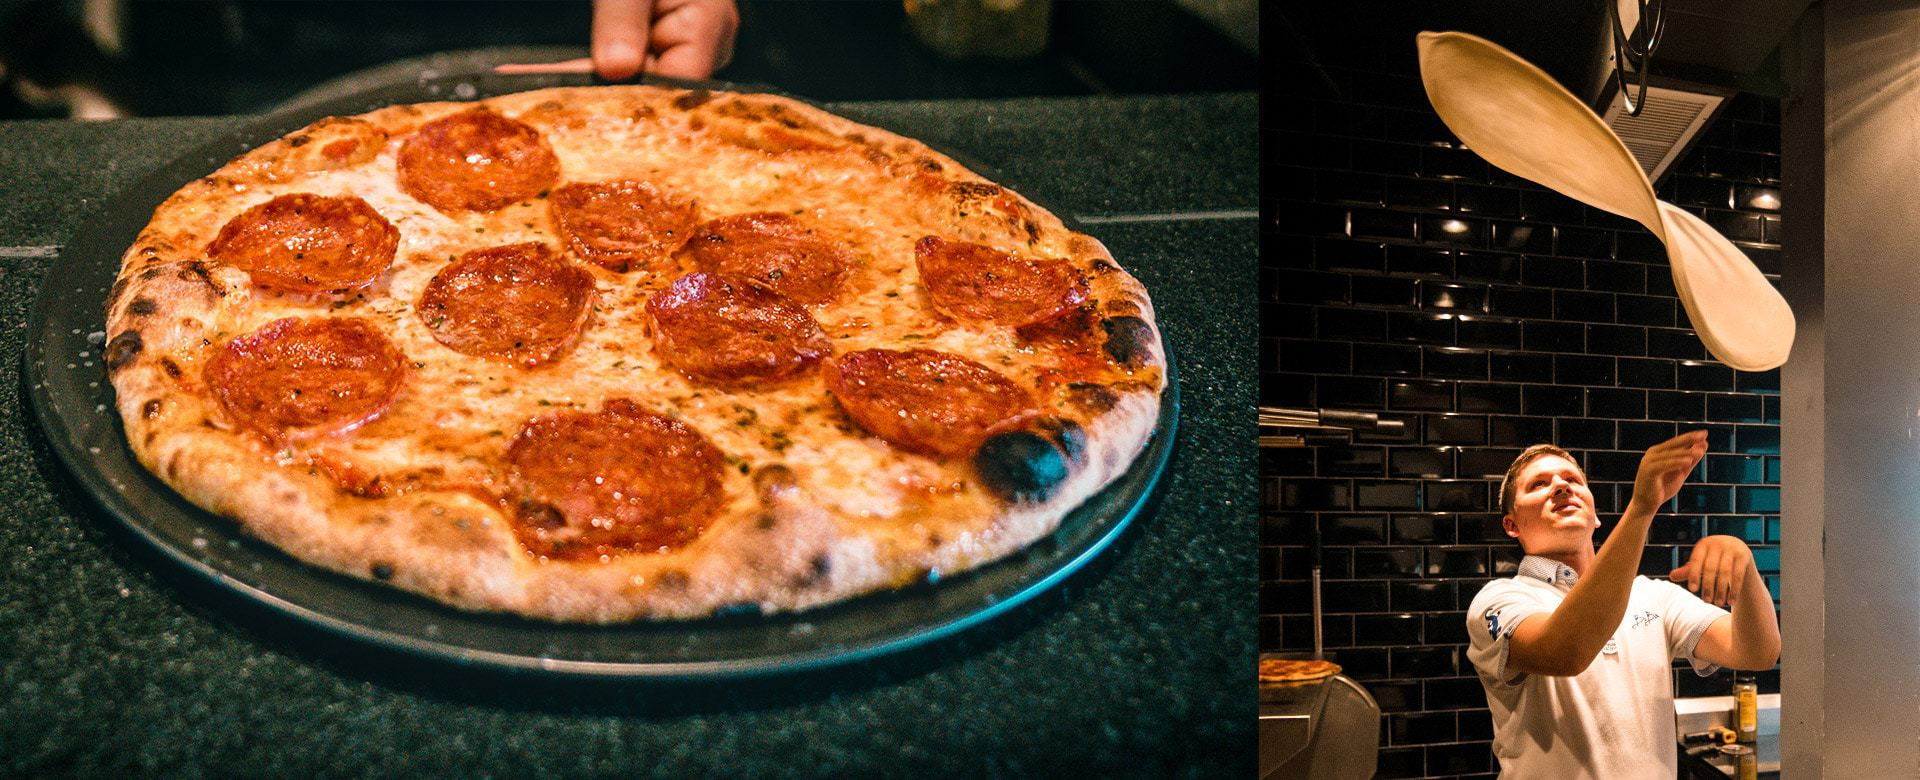 Homemade pizzas and pizzaiolo at Baba Beach Club - Photo courtesy of Baba Beach Club Phuket